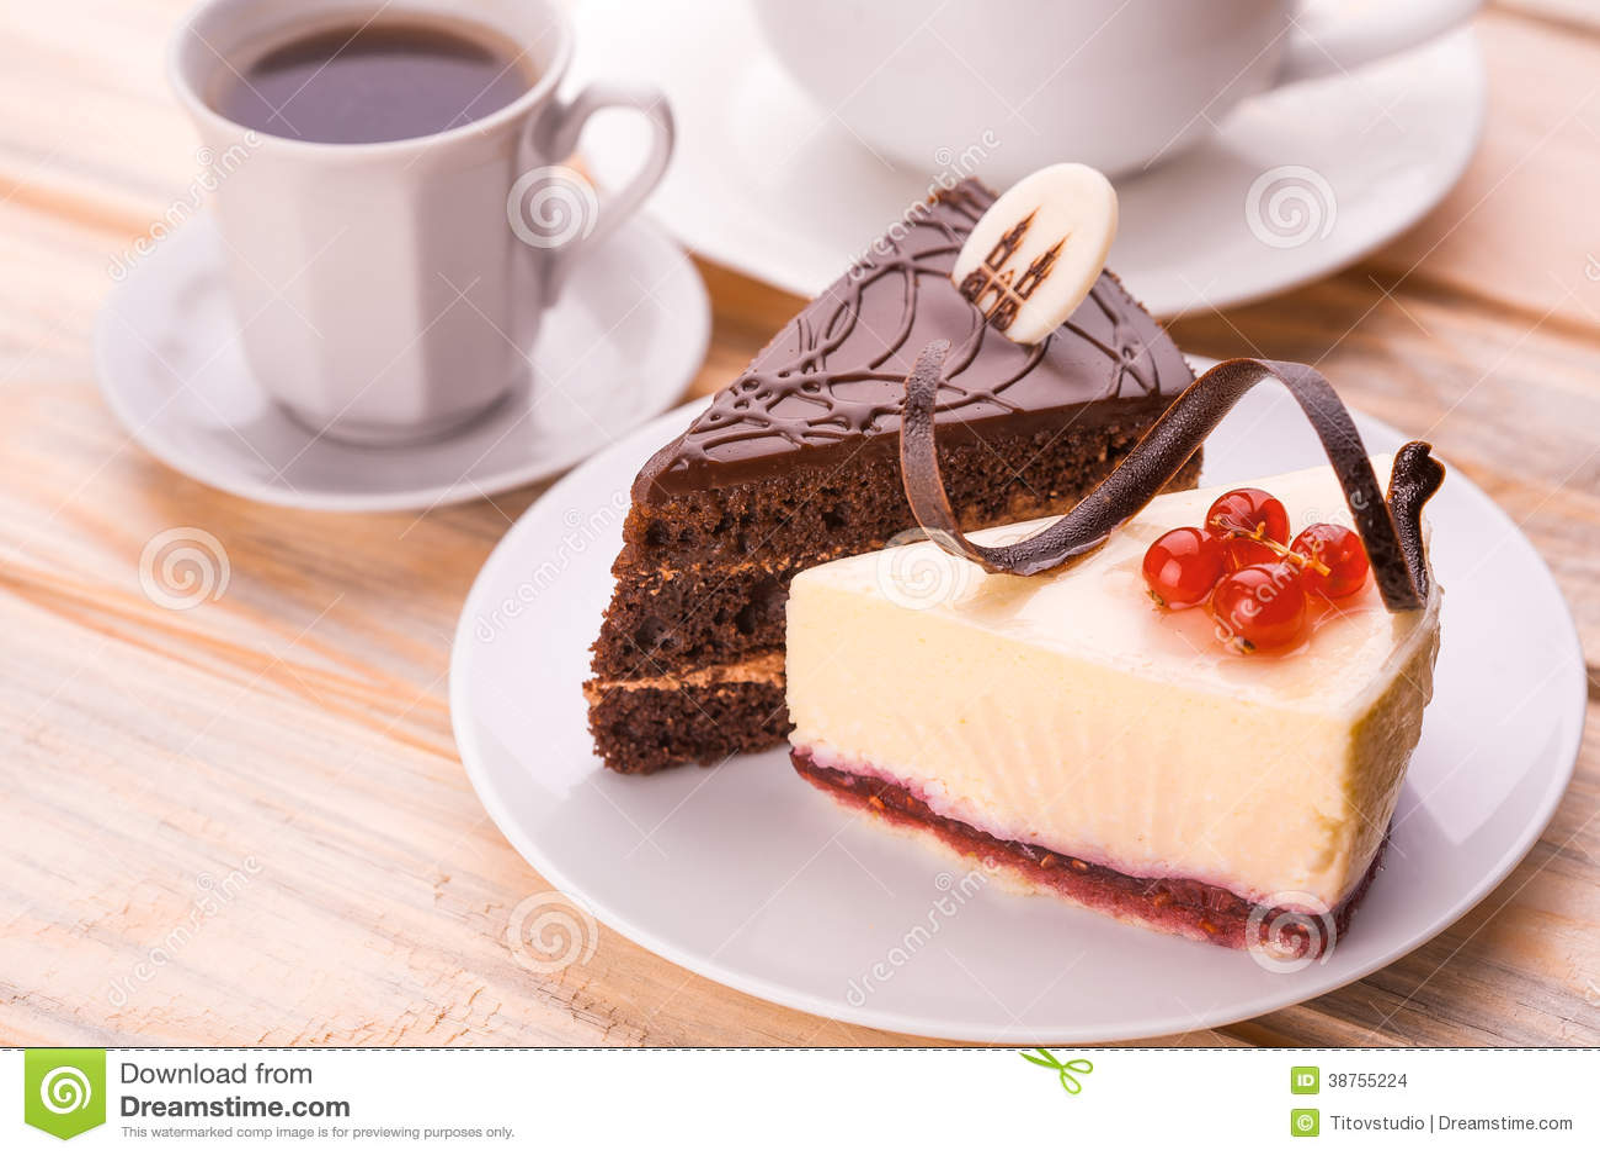 Coffee Cup C Cake